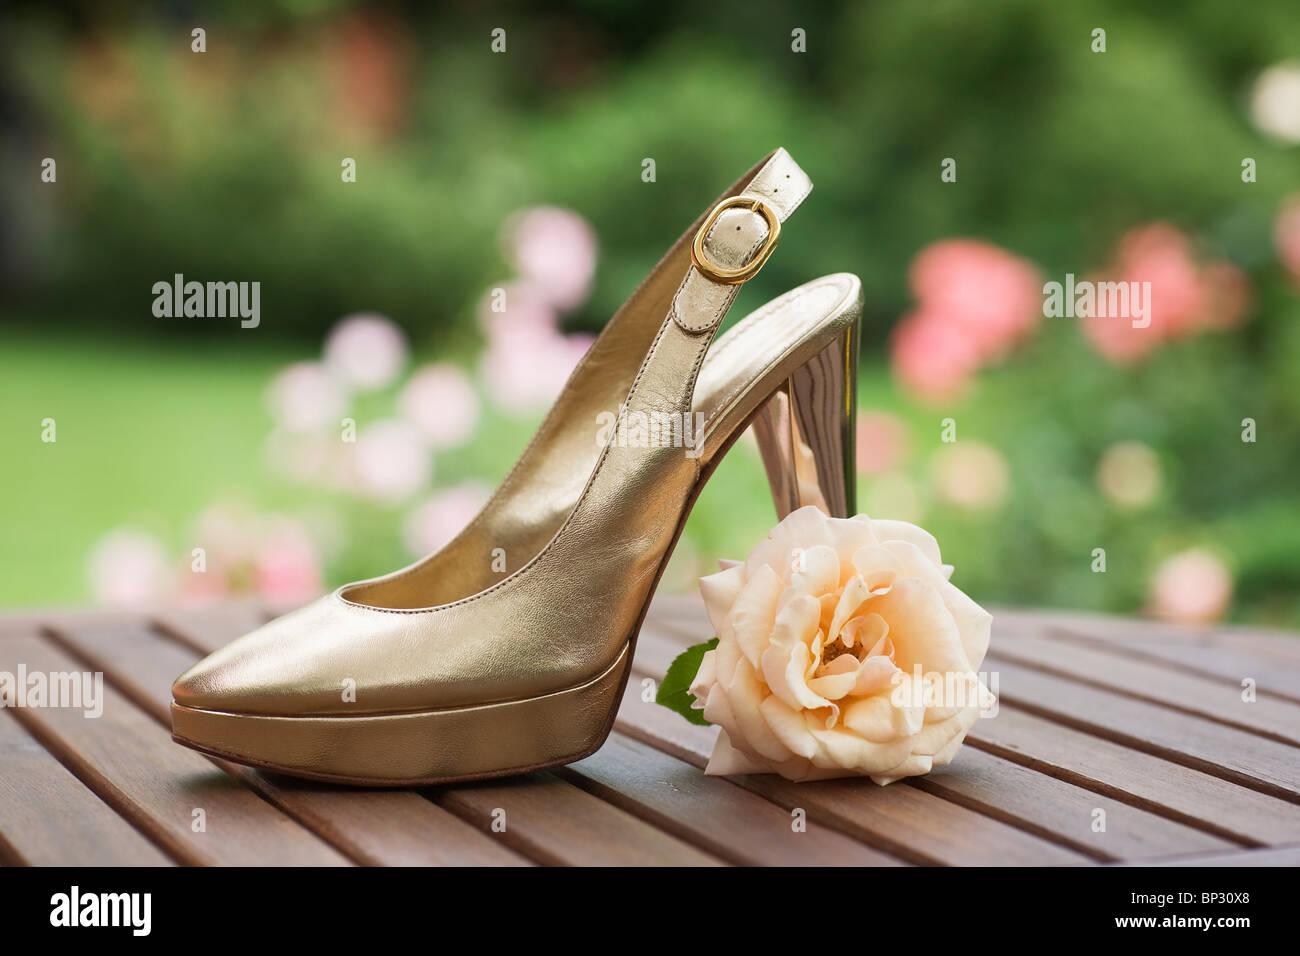 3b2f2c8a3f56c Gold High Heels Stock Photos & Gold High Heels Stock Images - Alamy